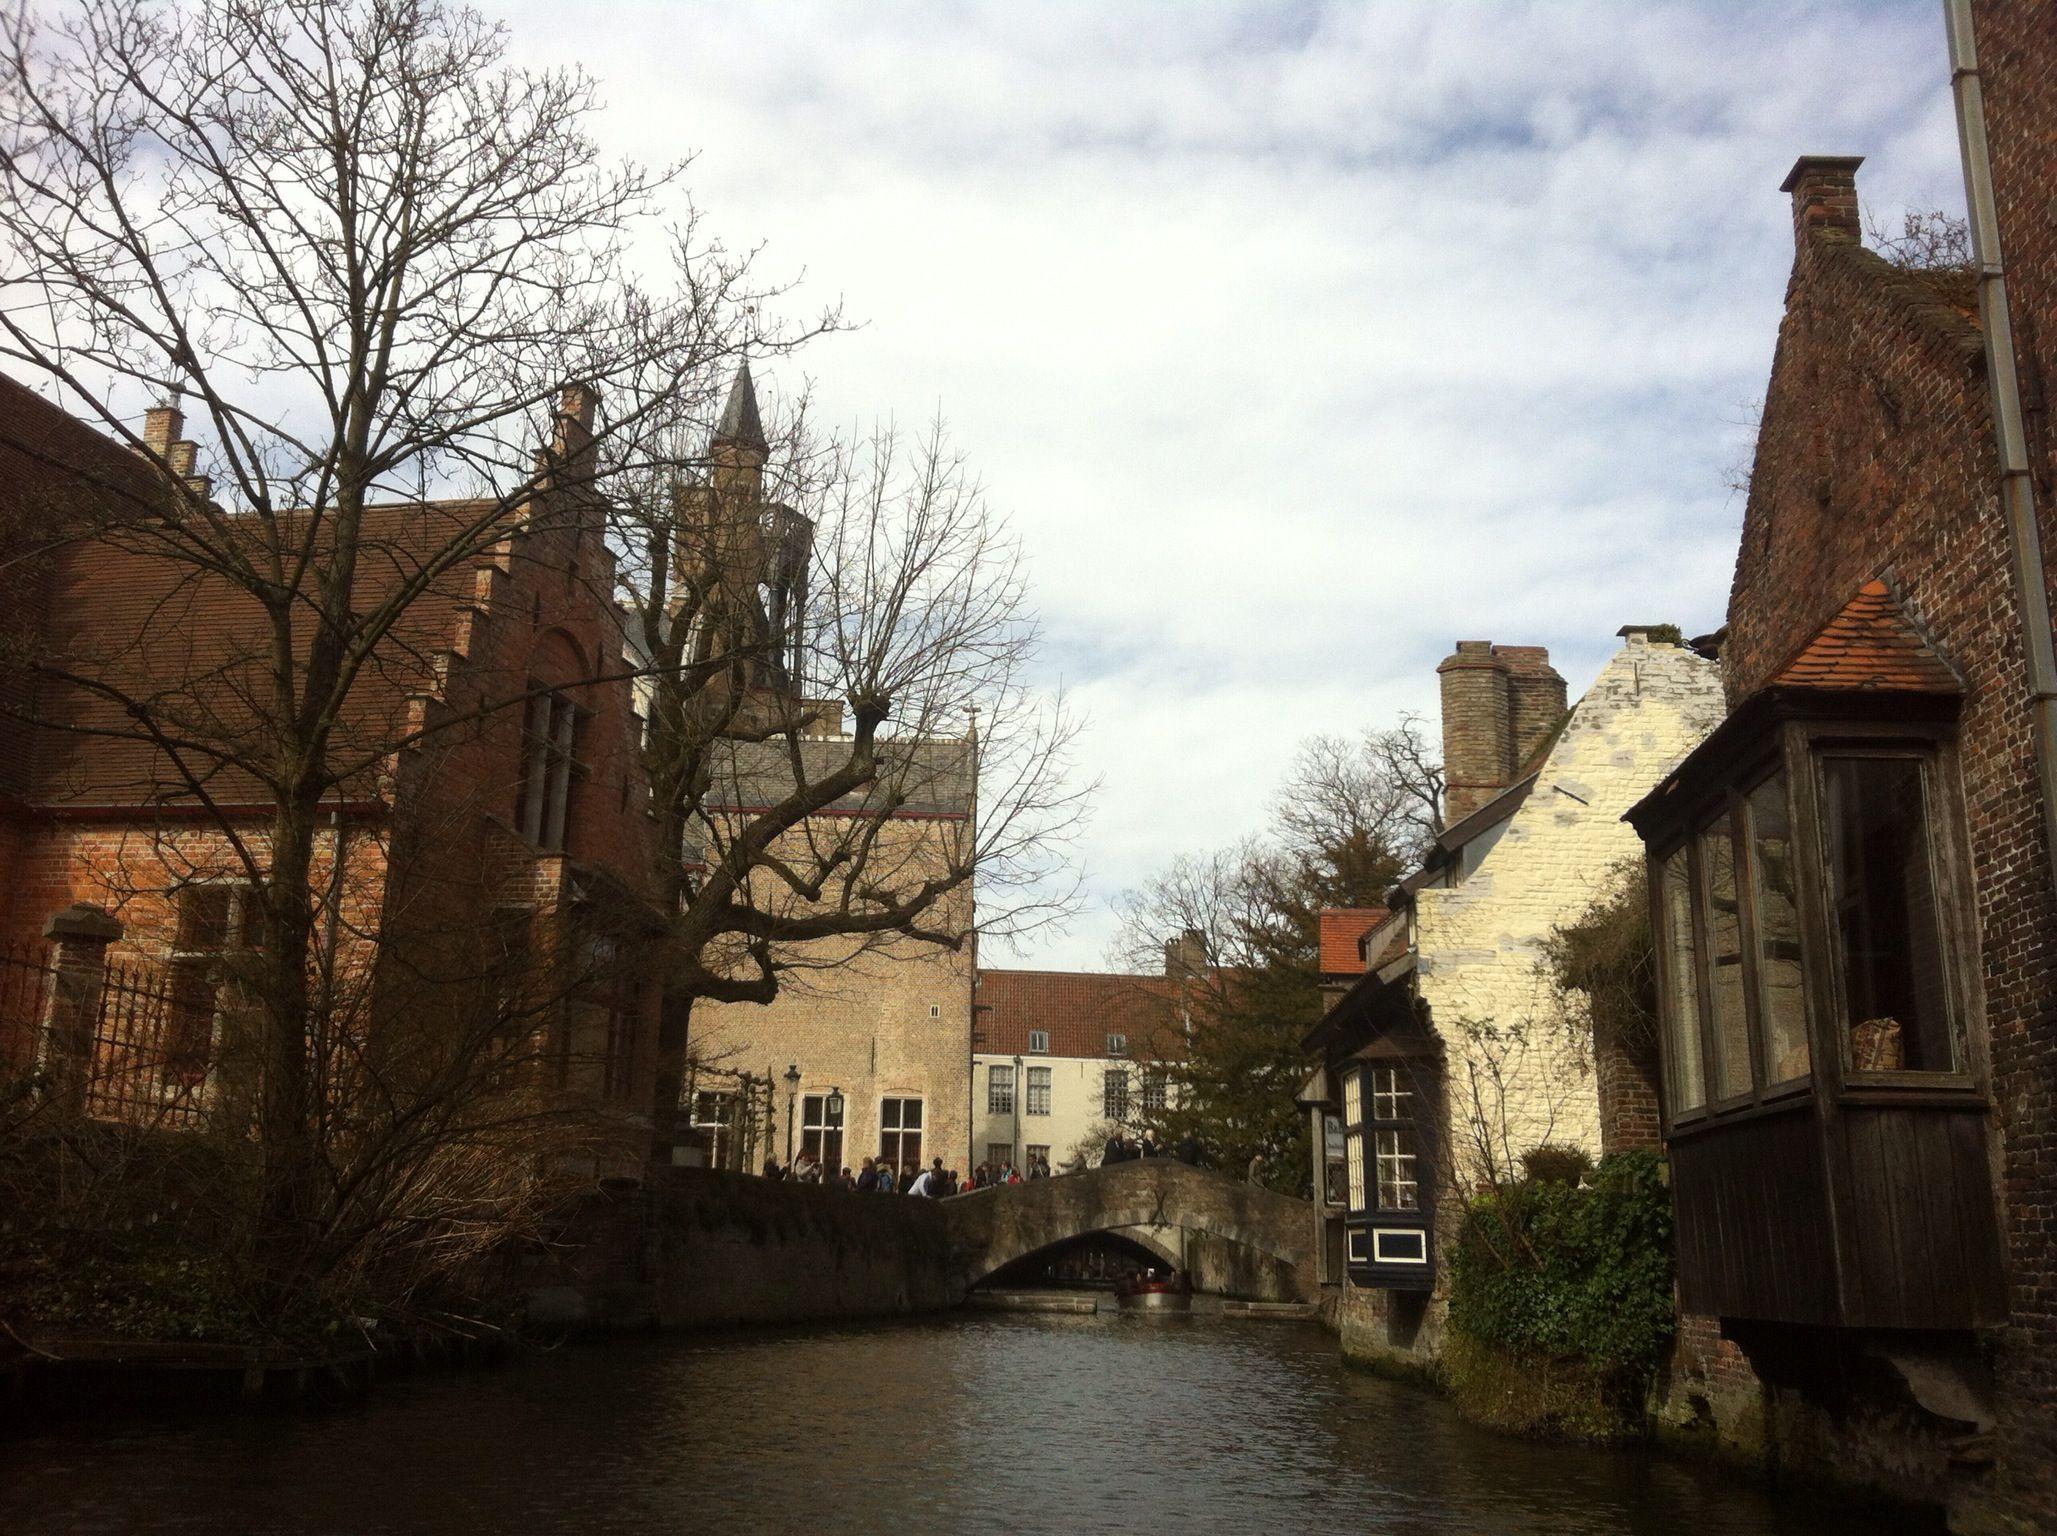 Brugge Belgium- Beautiful part of the world. Will definitely go back.